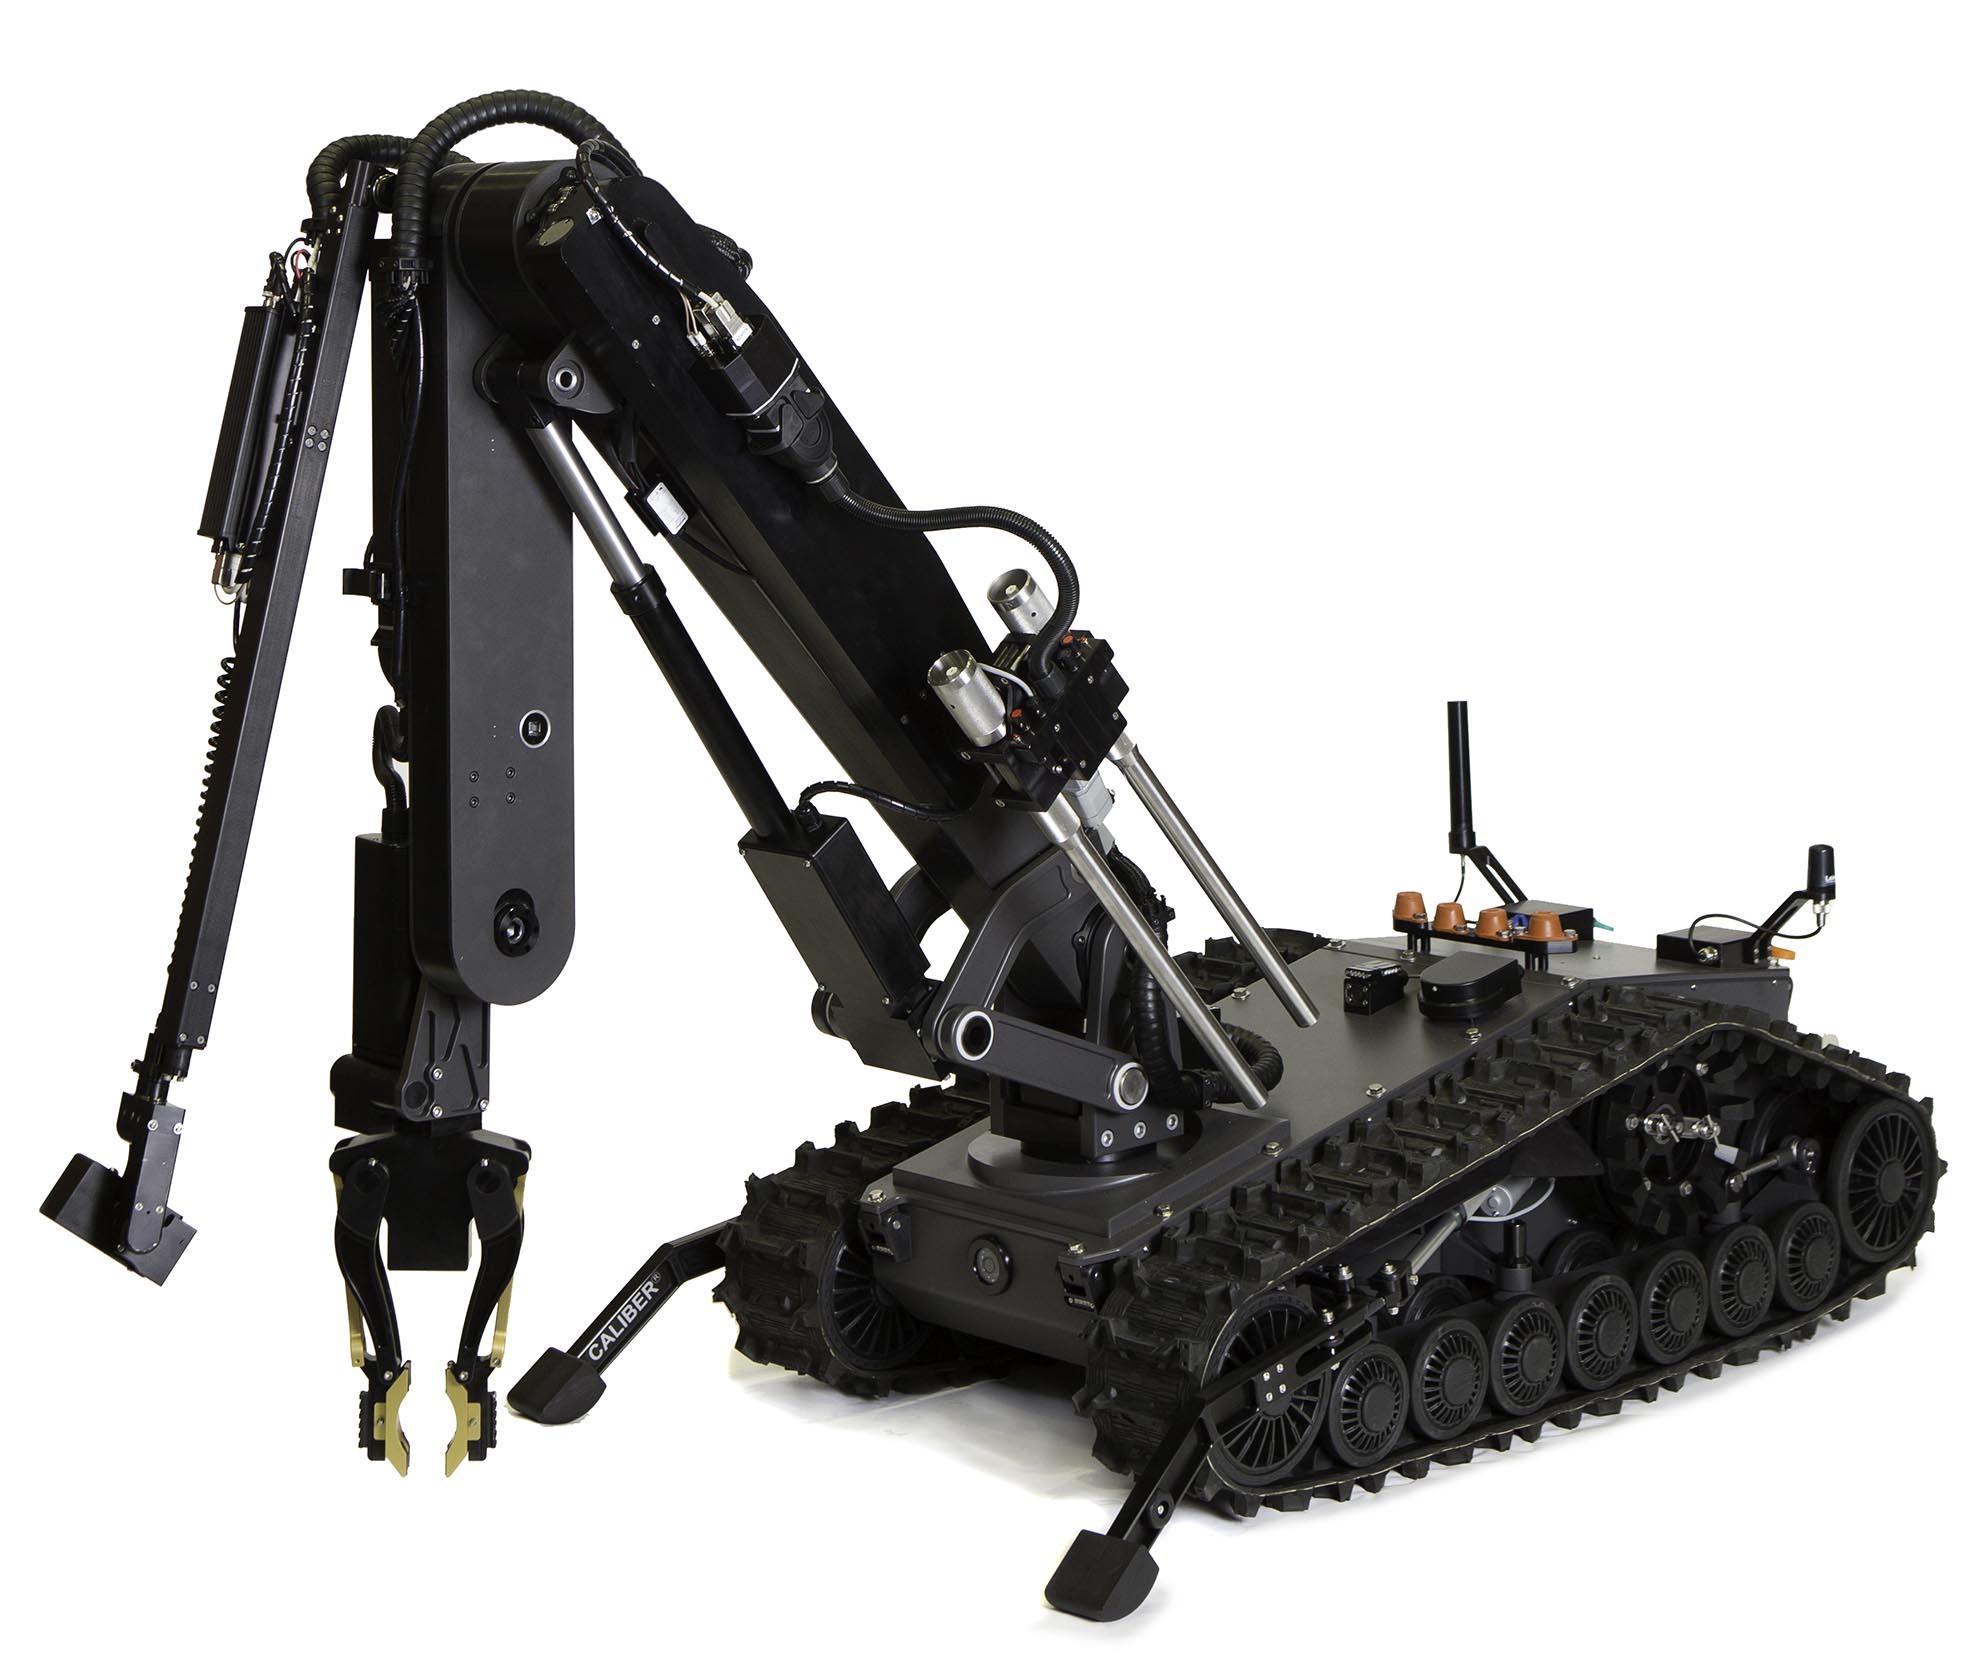 caliber-mk4-lvbied-robot-pick-up